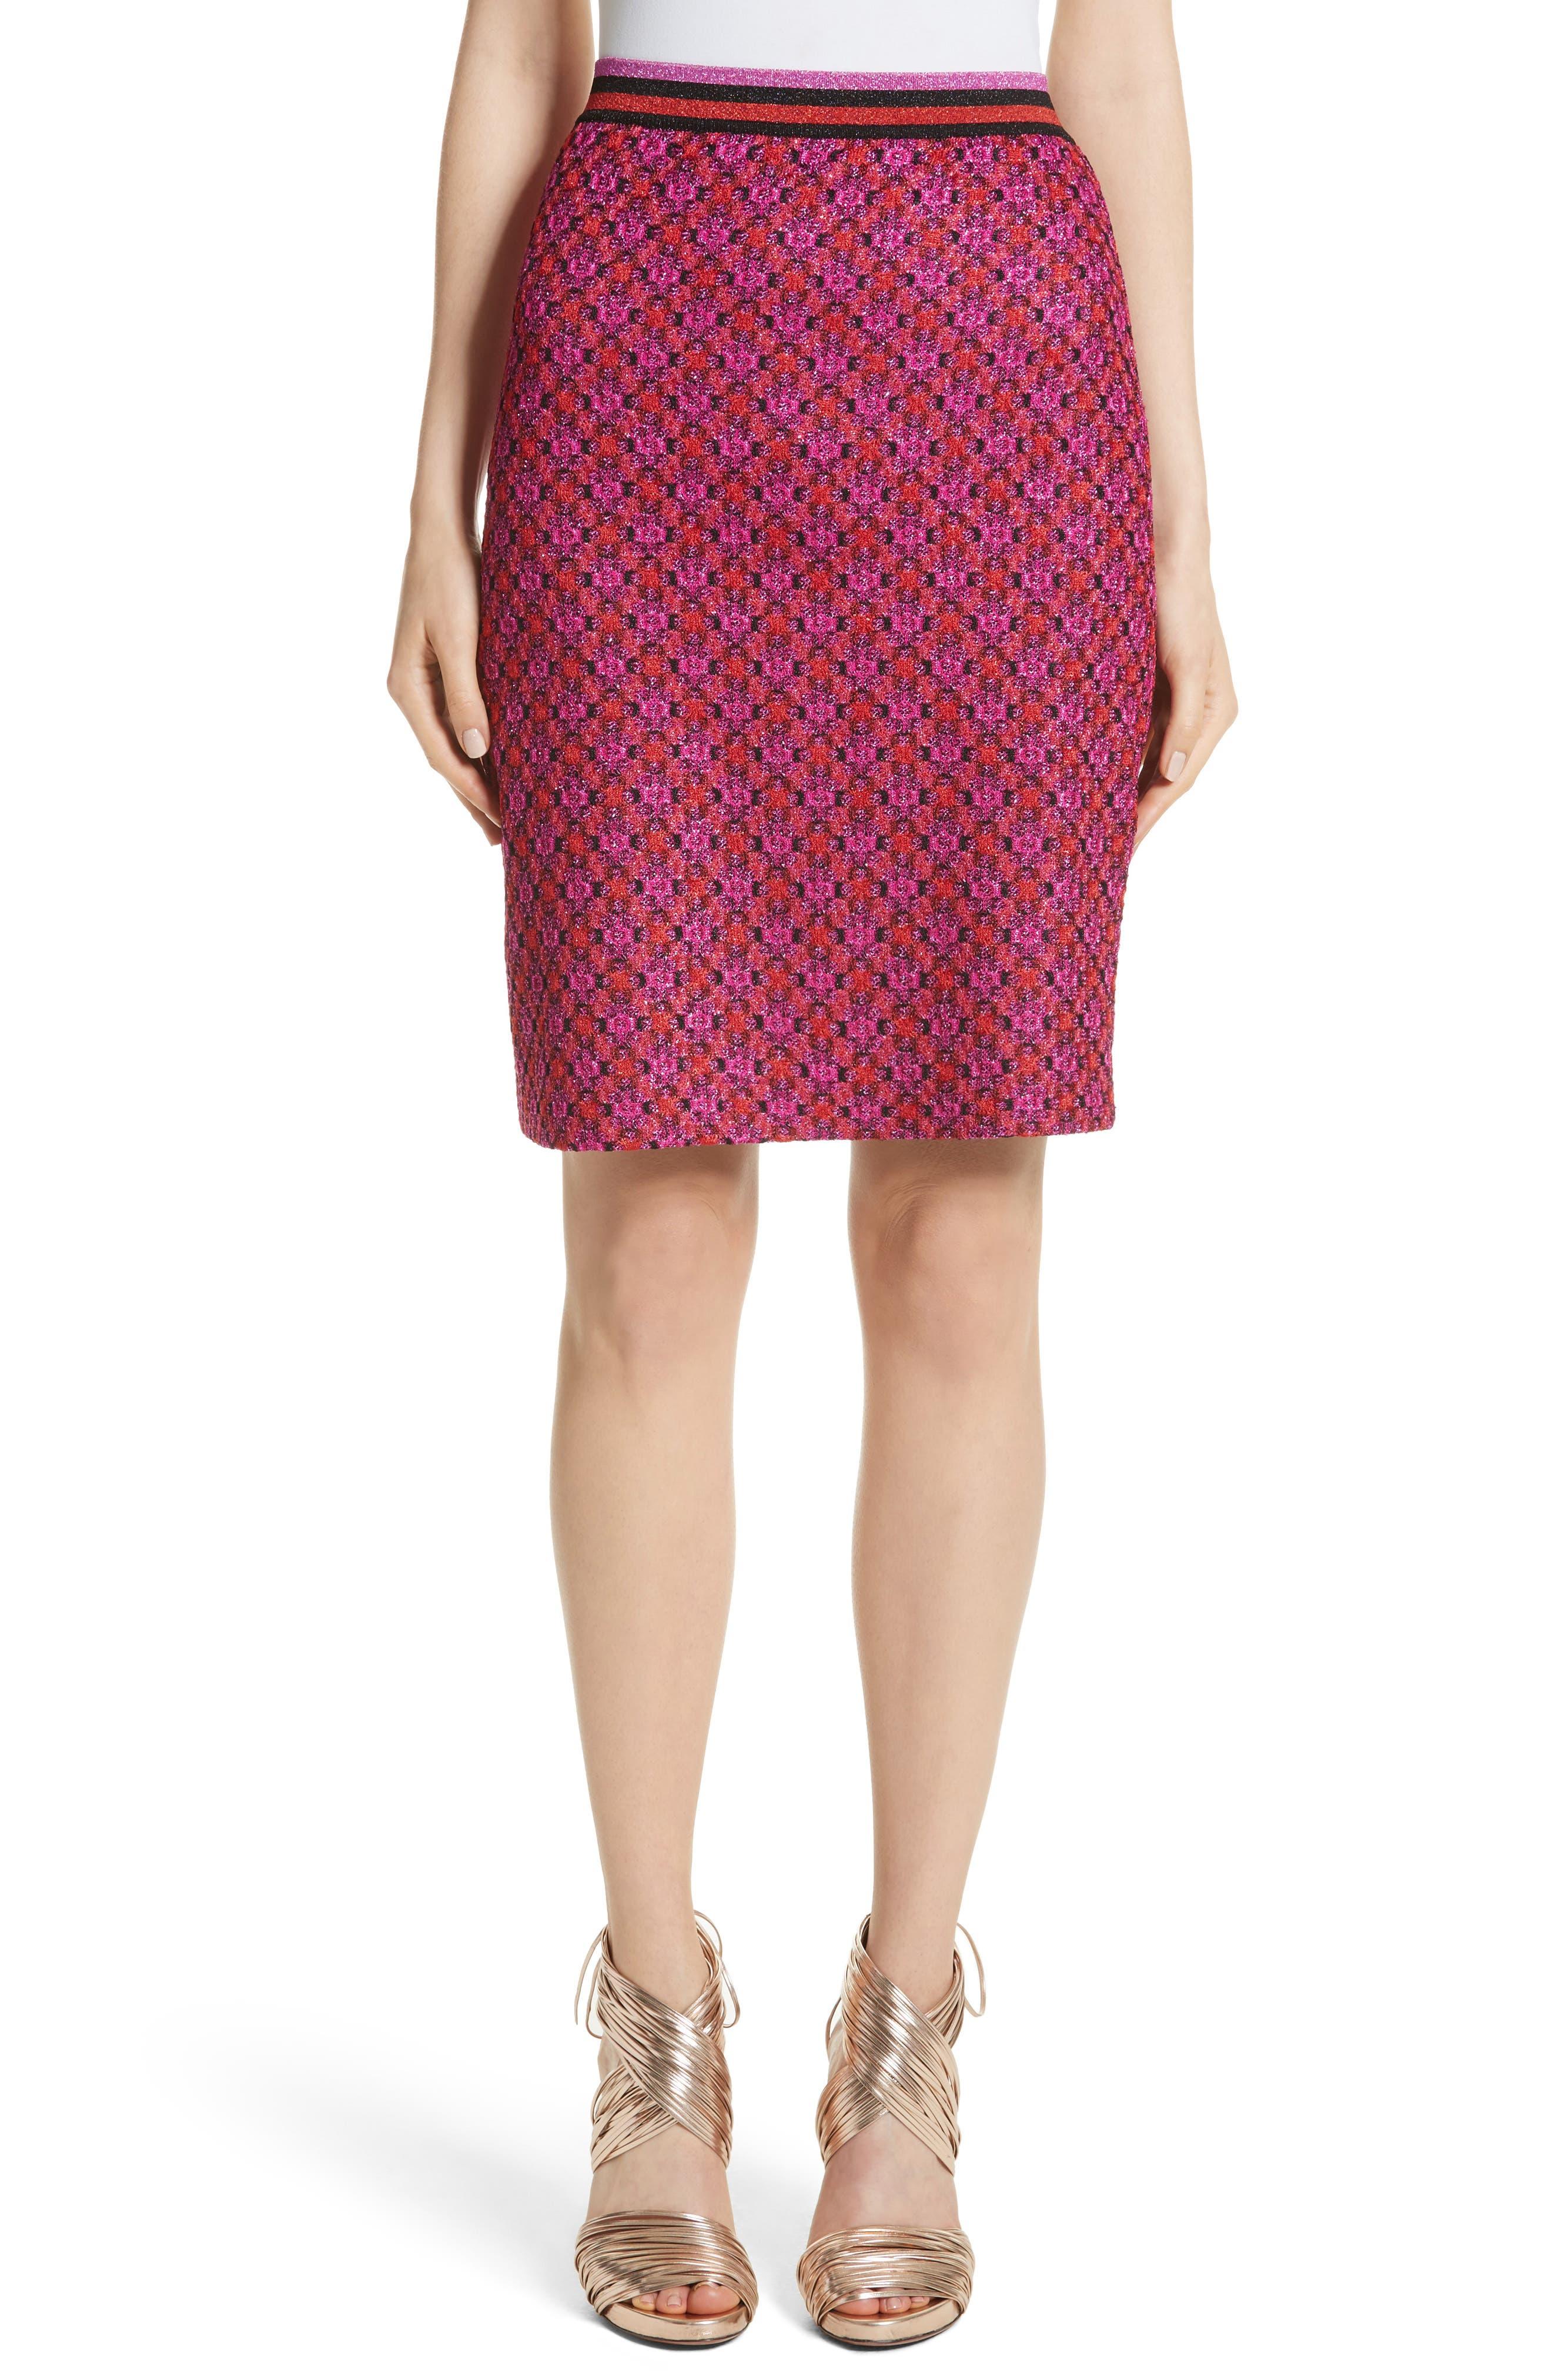 Alternate Image 1 Selected - Missoni Metallic Crisscross Knit Pencil Skirt